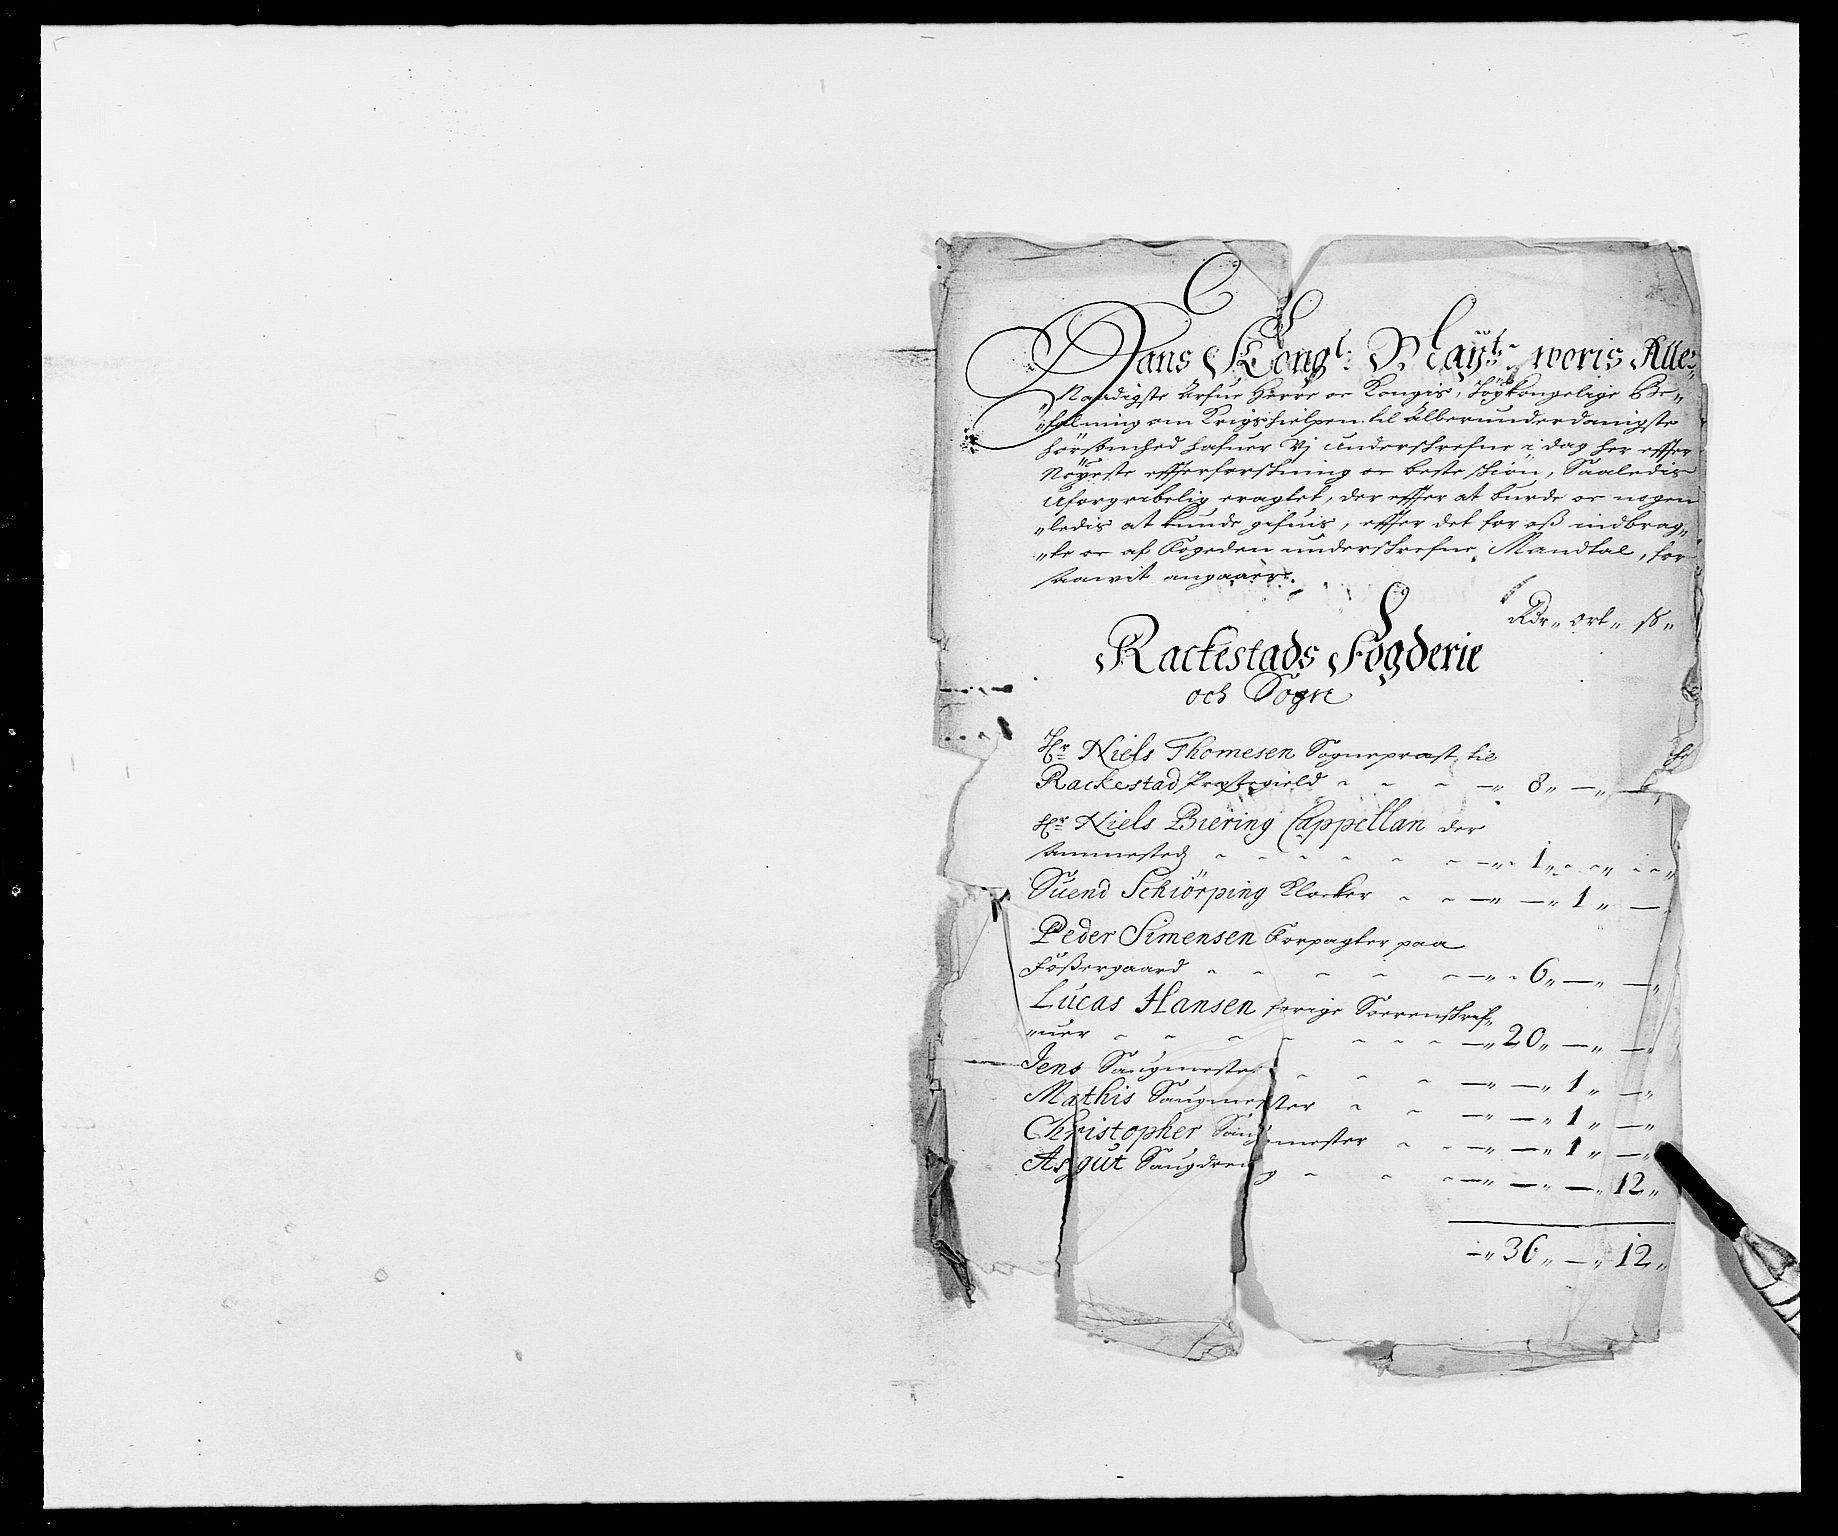 RA, Rentekammeret inntil 1814, Reviderte regnskaper, Fogderegnskap, R05/L0274: Fogderegnskap Rakkestad, 1683-1684, s. 207